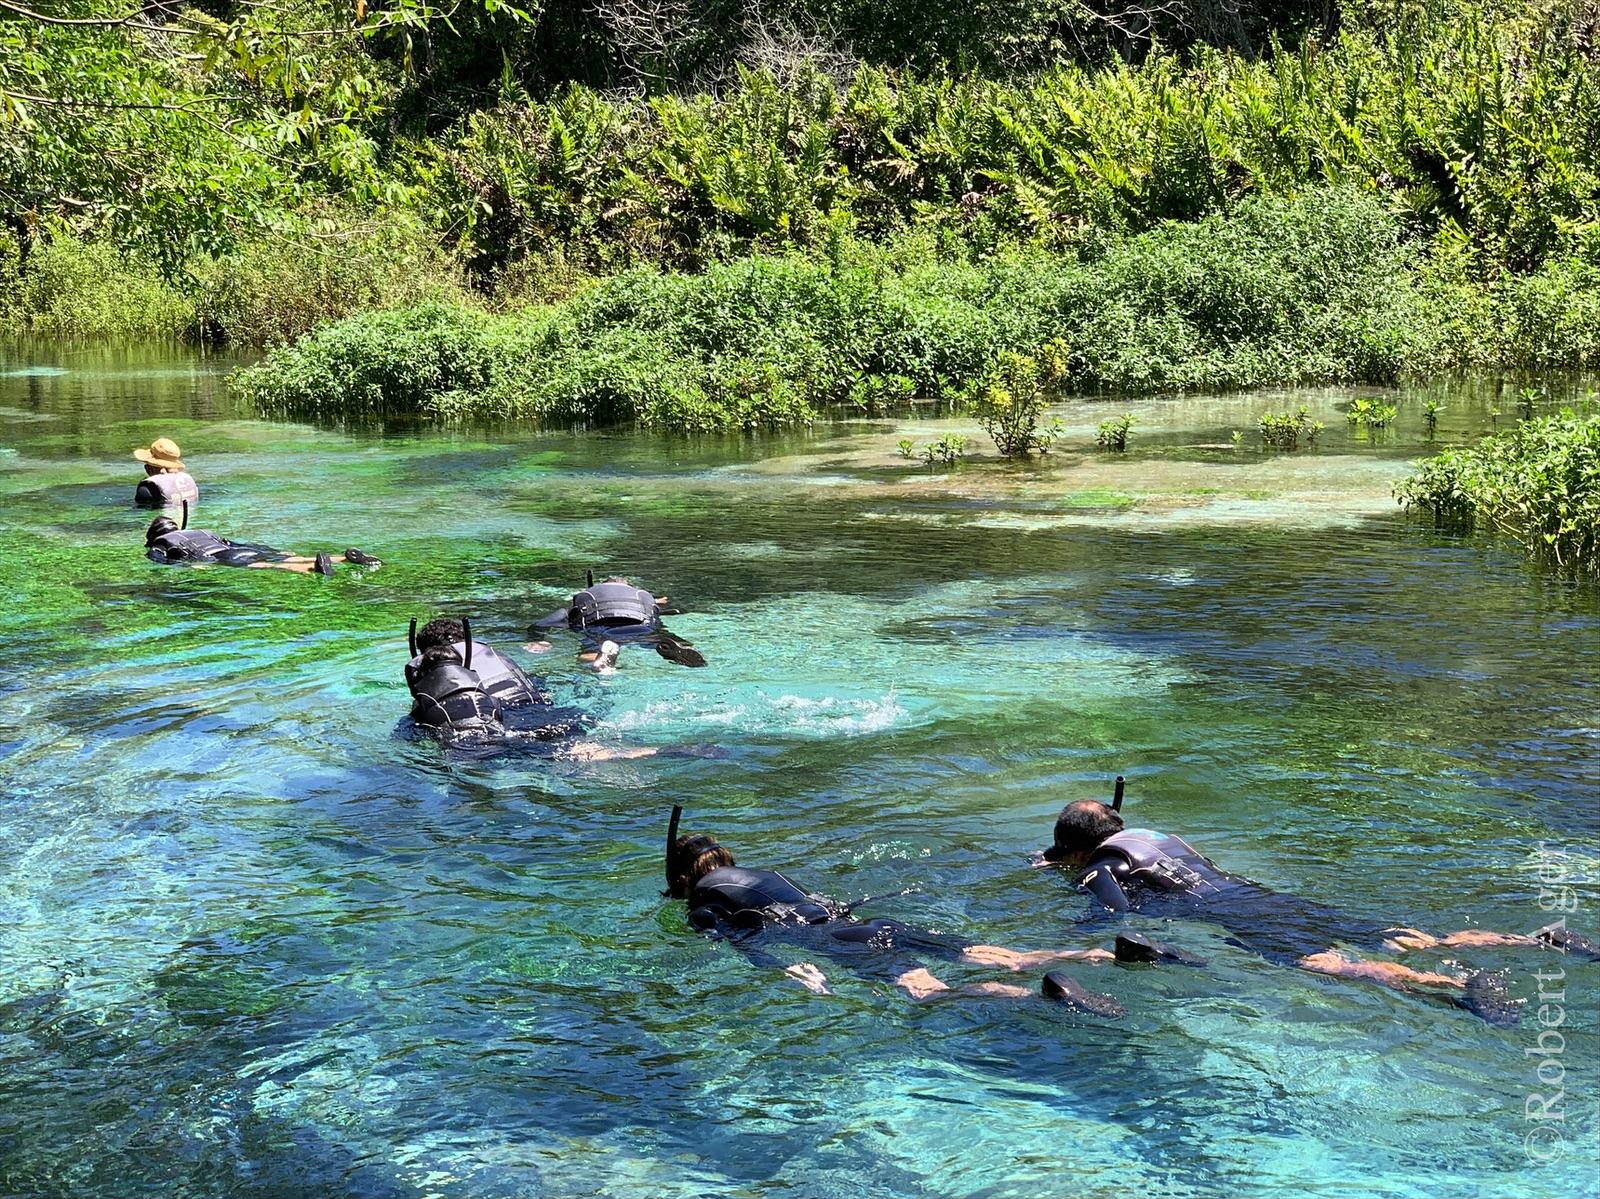 051_Overlander_Gaia_Pantanal